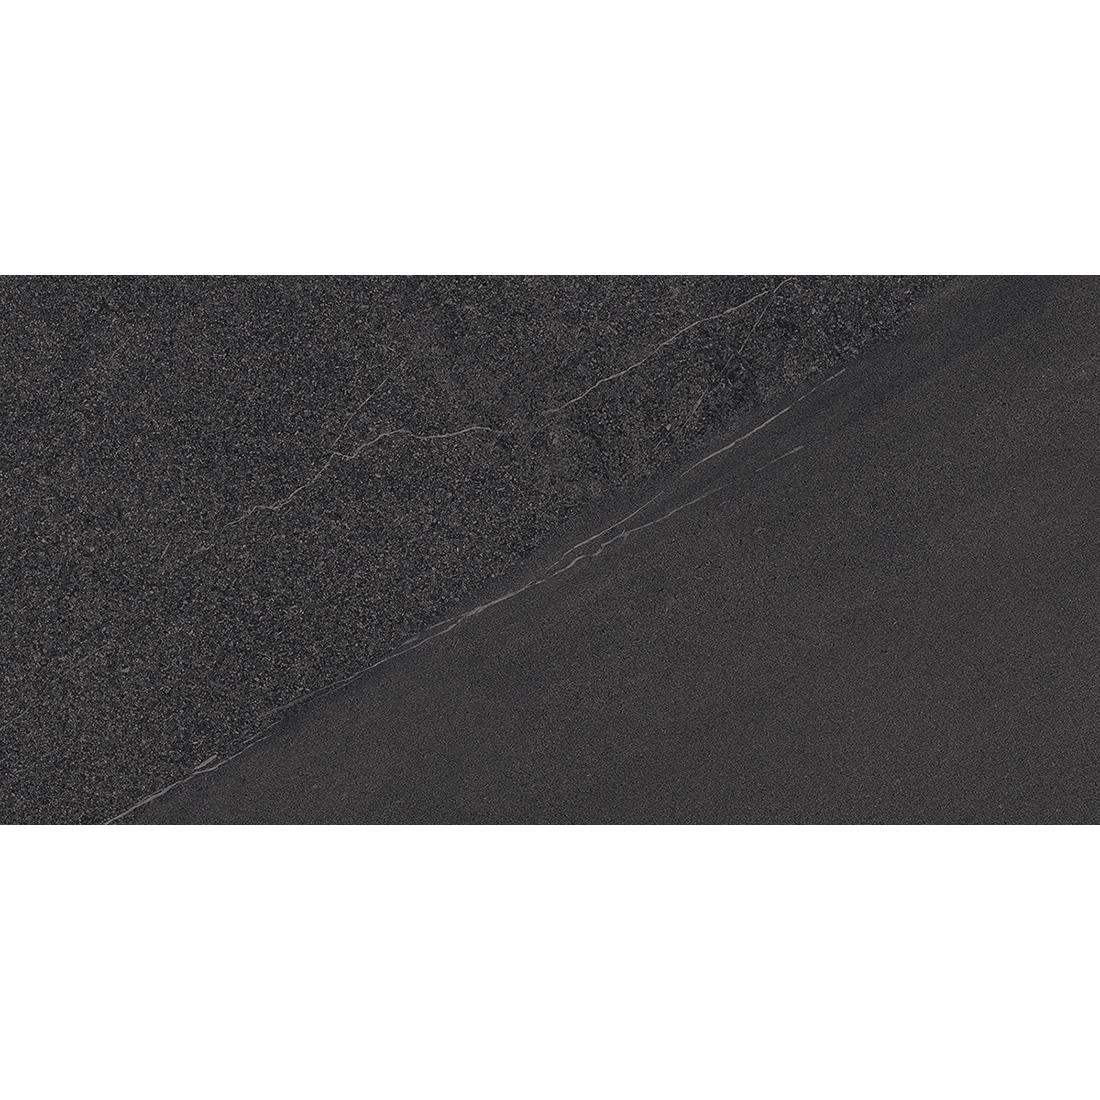 York 59x118.5 Anthracite Polished 1